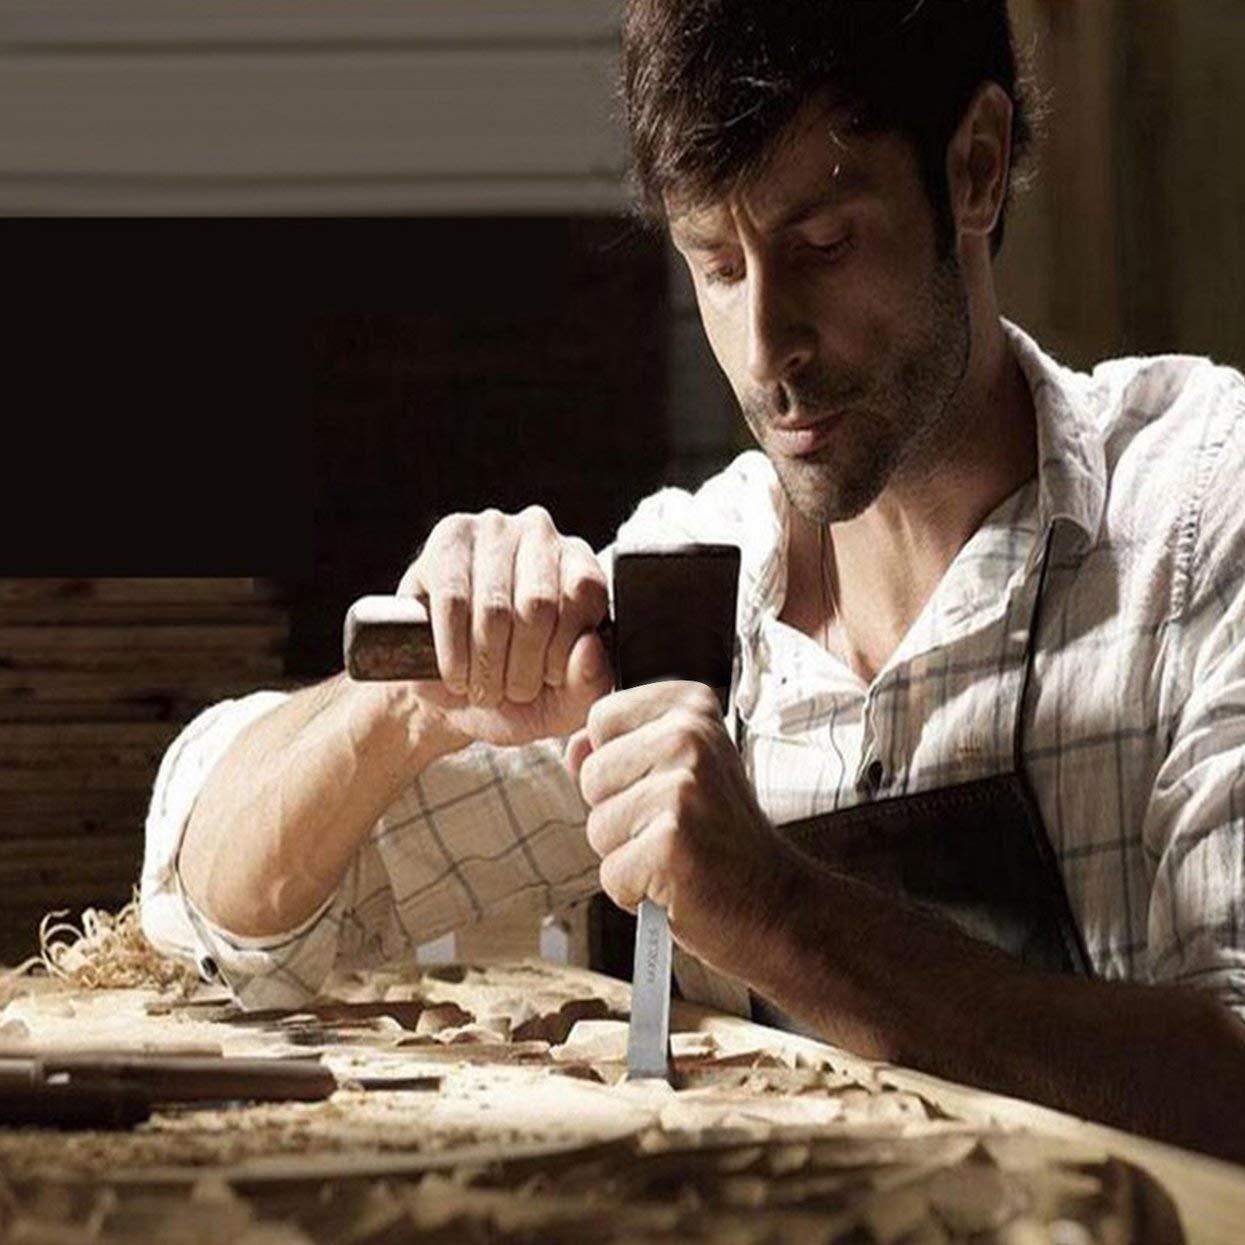 Tellaboull Set di scalpelli per intaglio in legno di alta qualit/à CRV Set 6mm-26mm per strumenti di intaglio per carpentiere manuale di alta acciaio al manganese